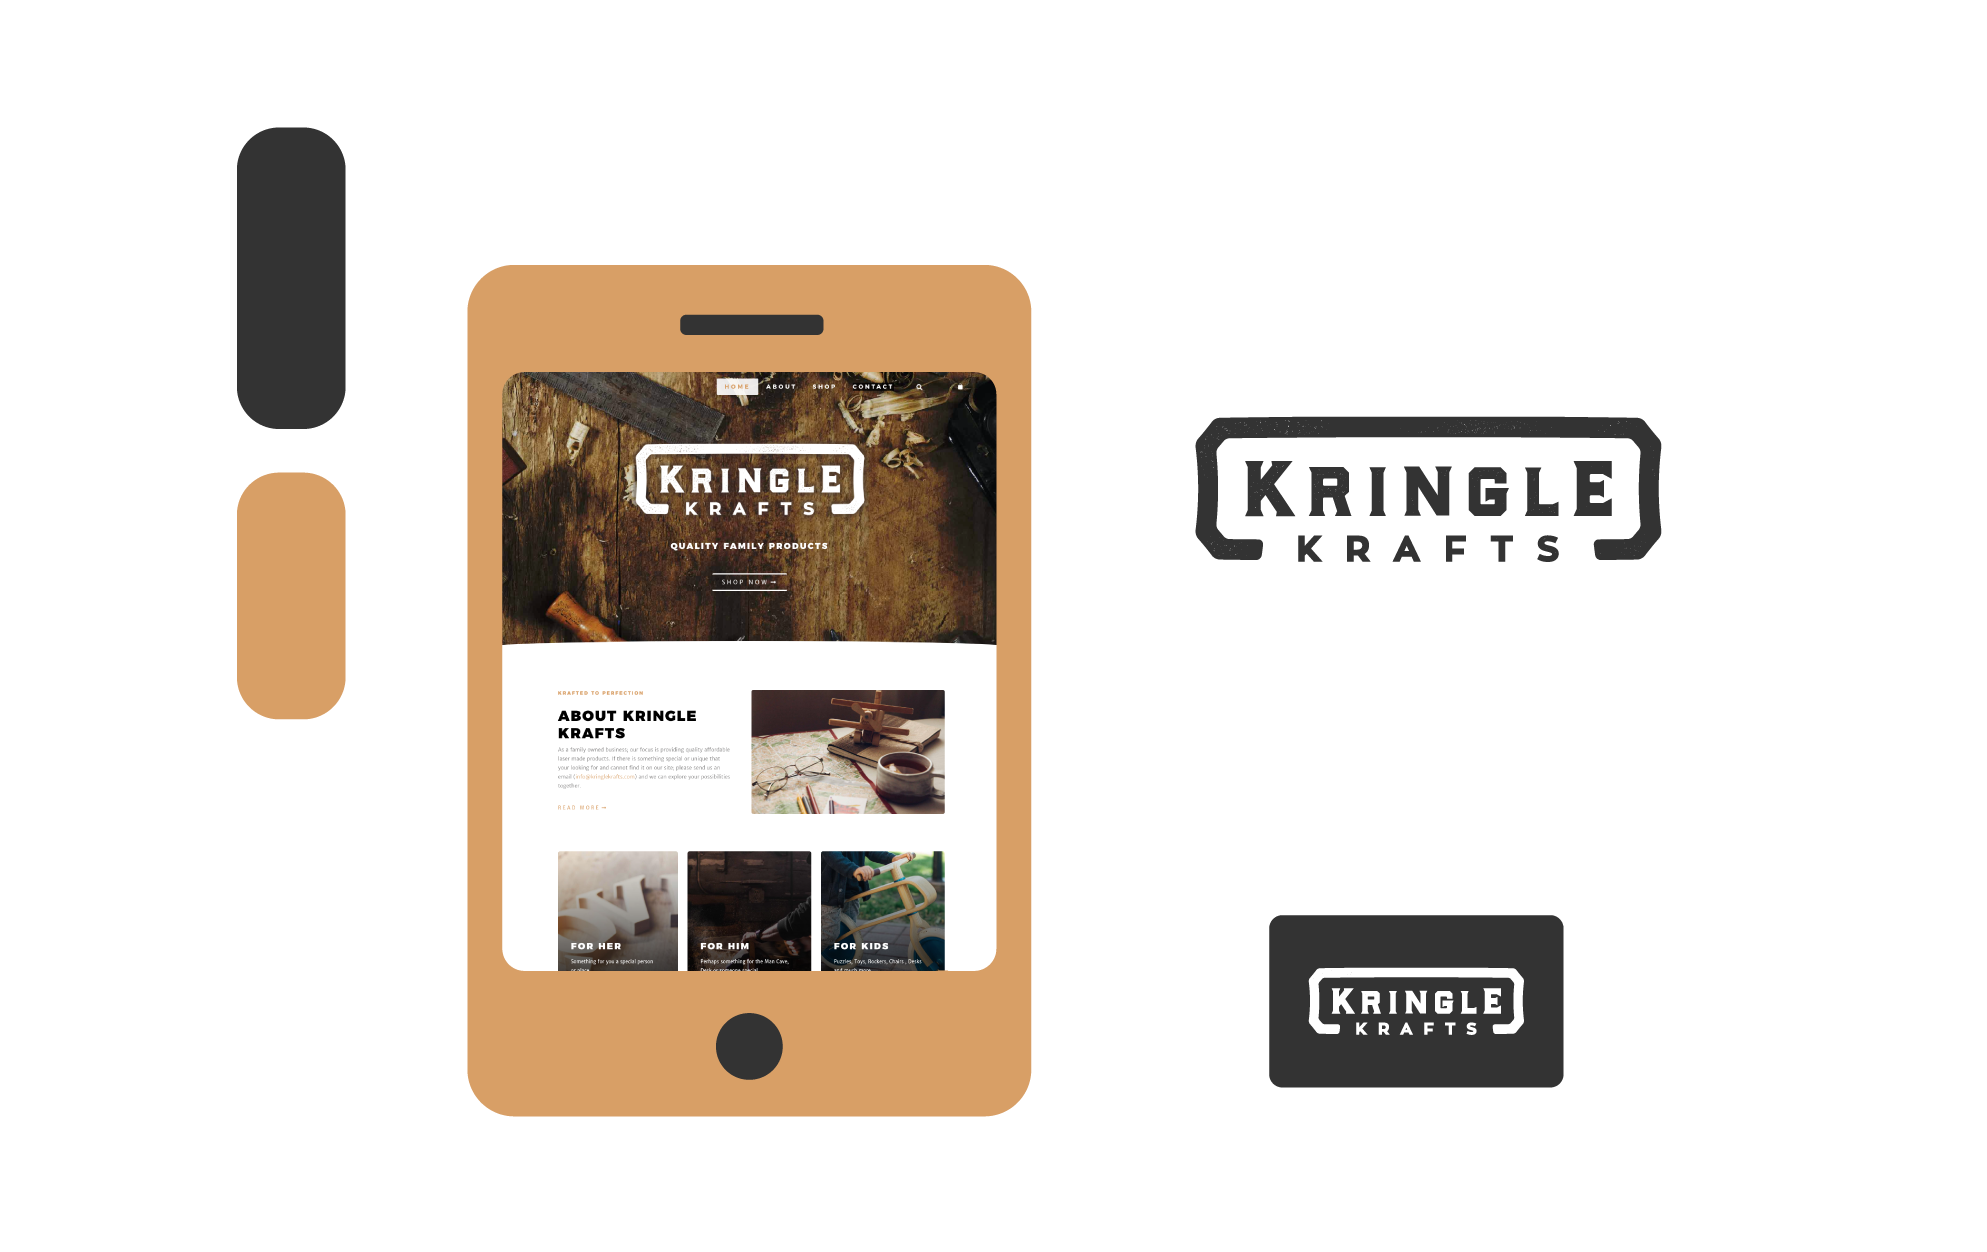 Freelance Graphic Design - Kringle Krafts Branding Feature